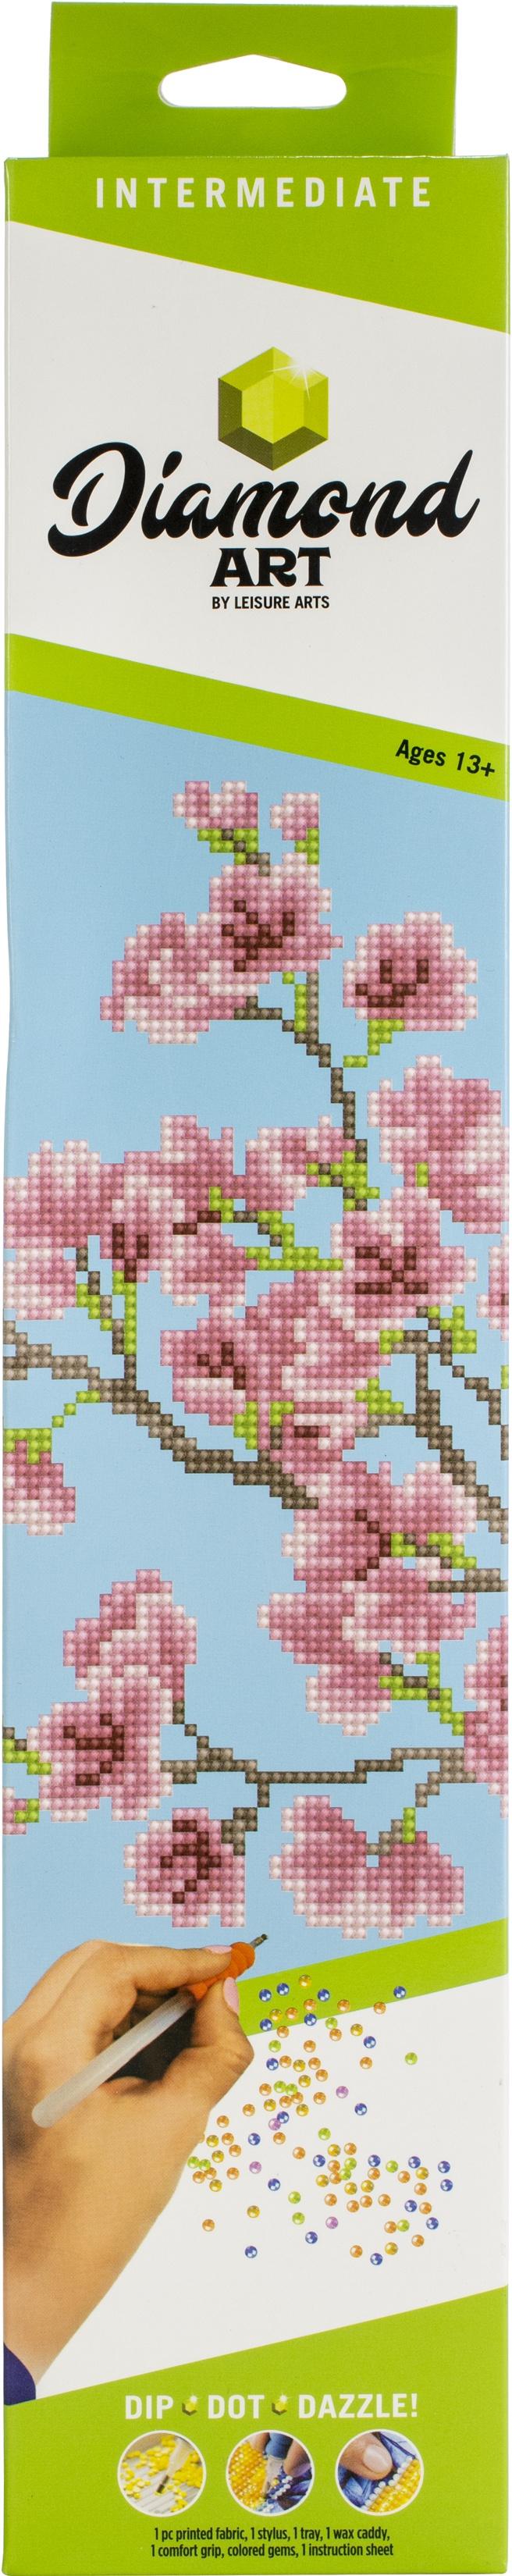 Diamond Art Kit 12x12 Intermediate CherryBlossom